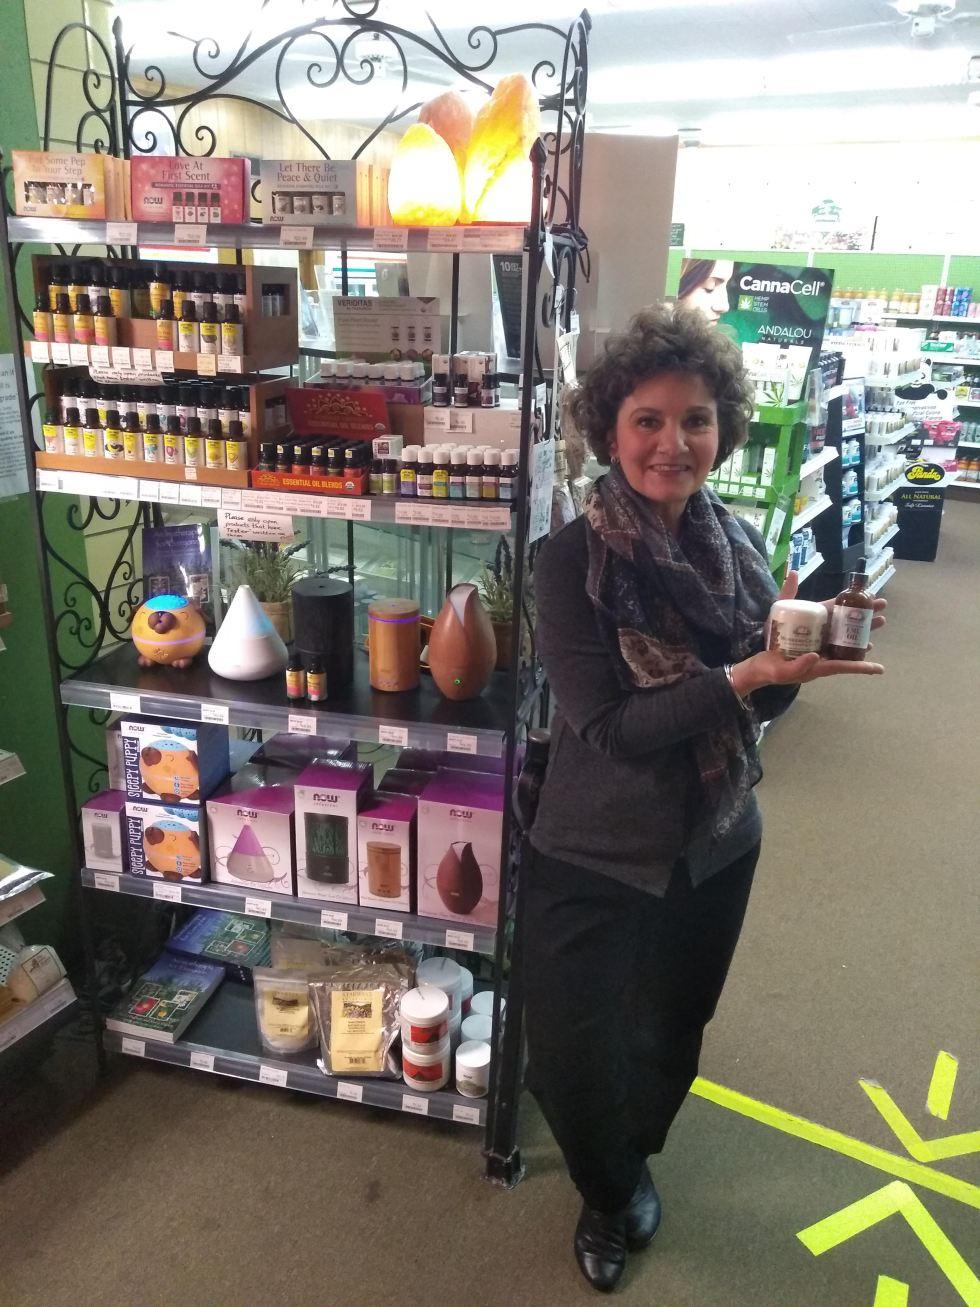 Jodi of The Olive Branch Nutrition